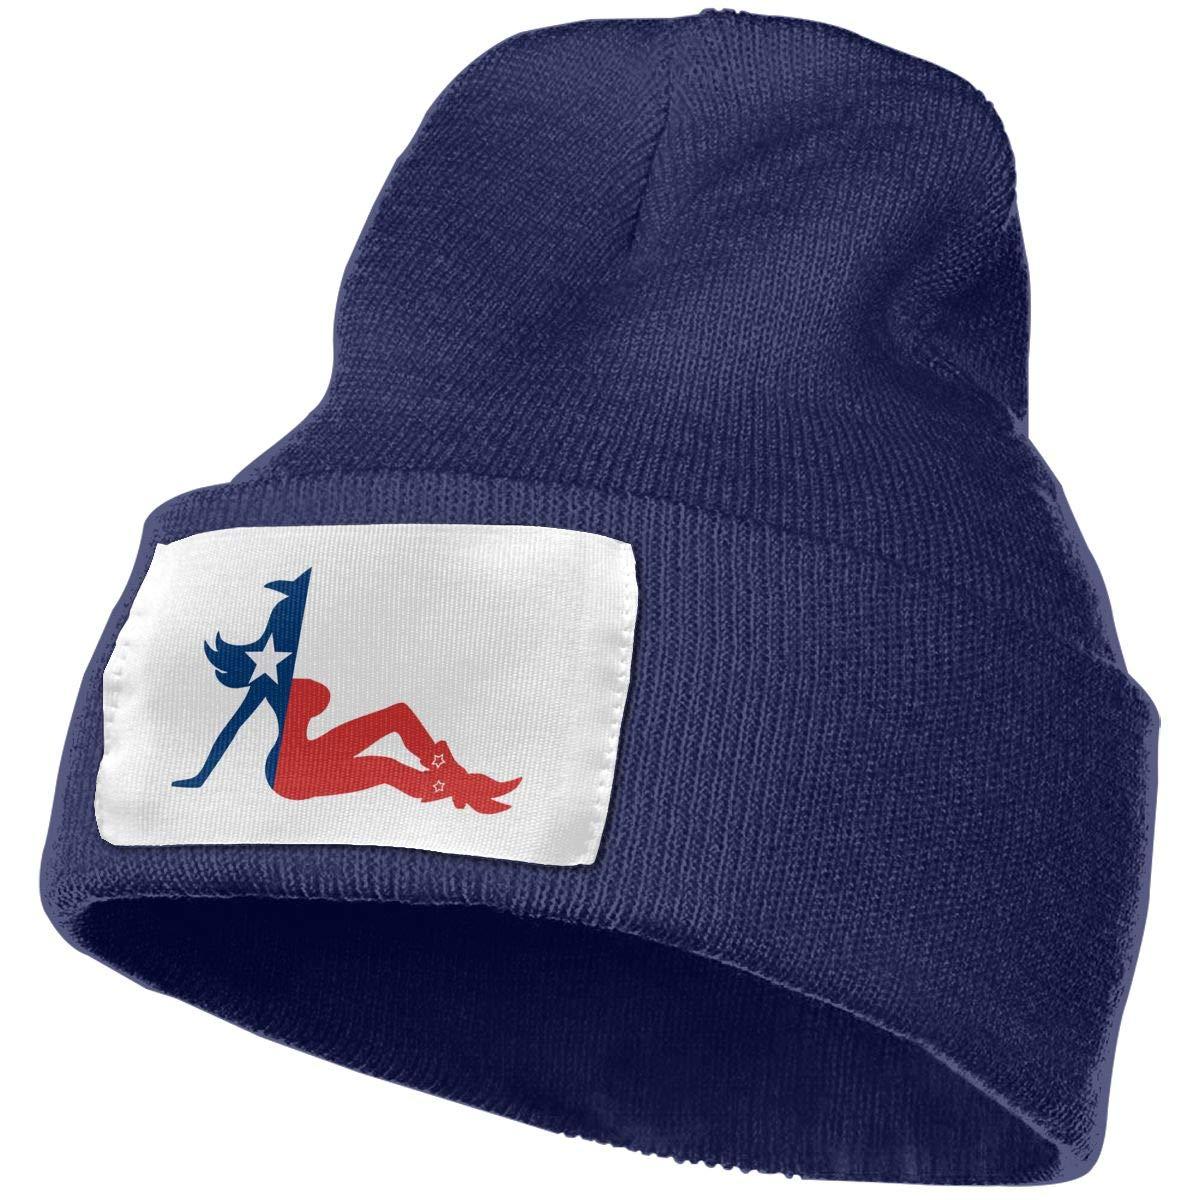 Adults Texas Flag Cowgirl Elastic Knitted Beanie Cap Winter Warm Skull Hats